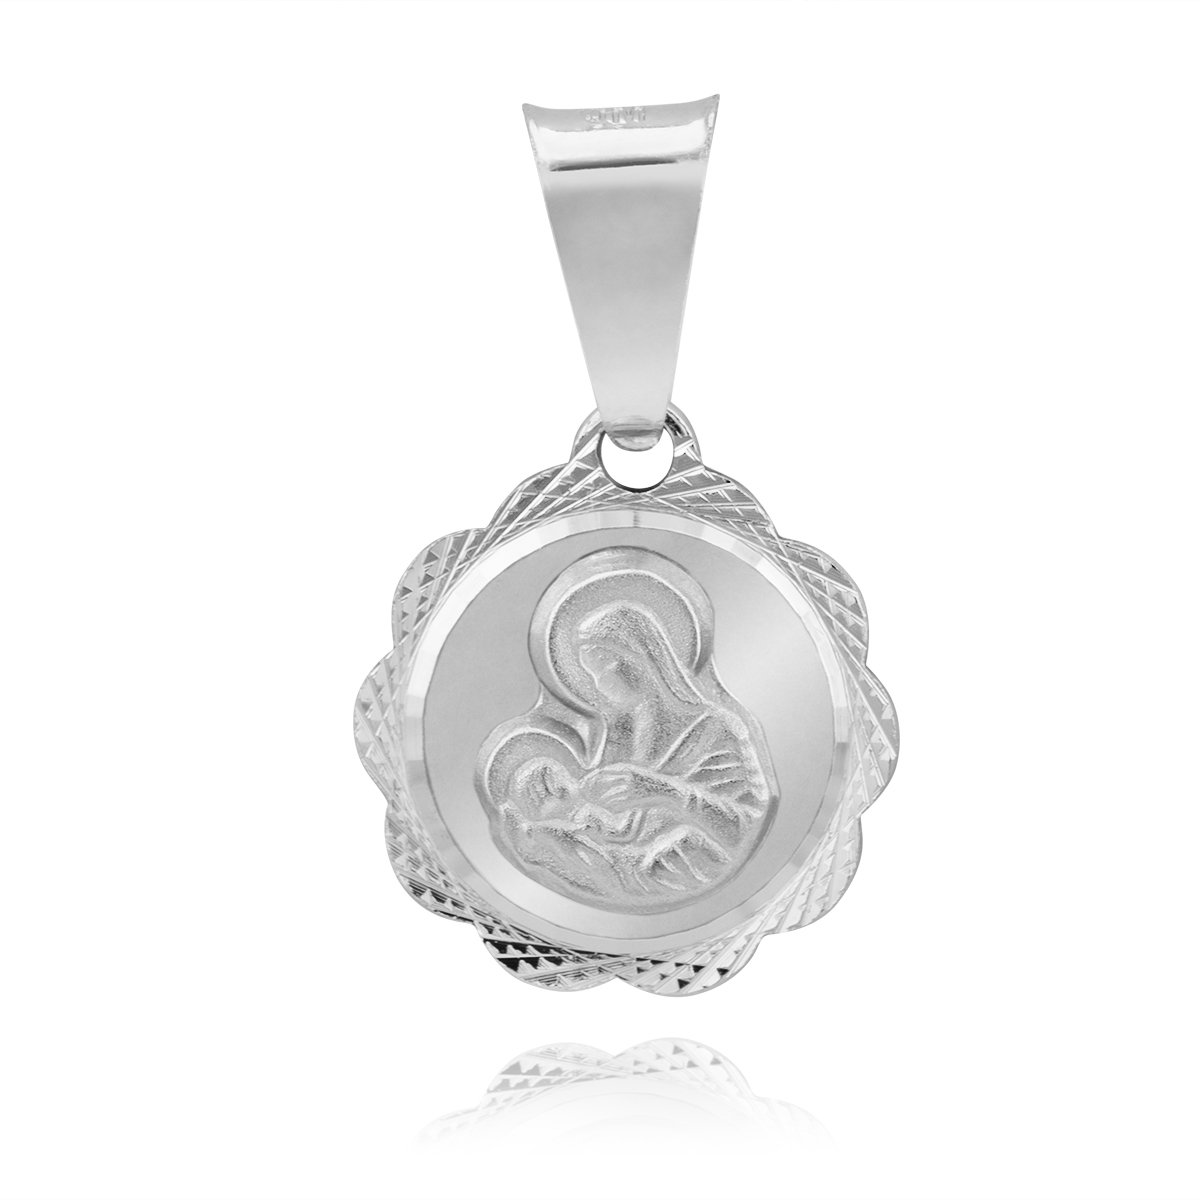 059f51dd557ae3 Srebrny medalik Matka Boska karmiąca; Srebrny medalik Matka Boska karmiąca  ...